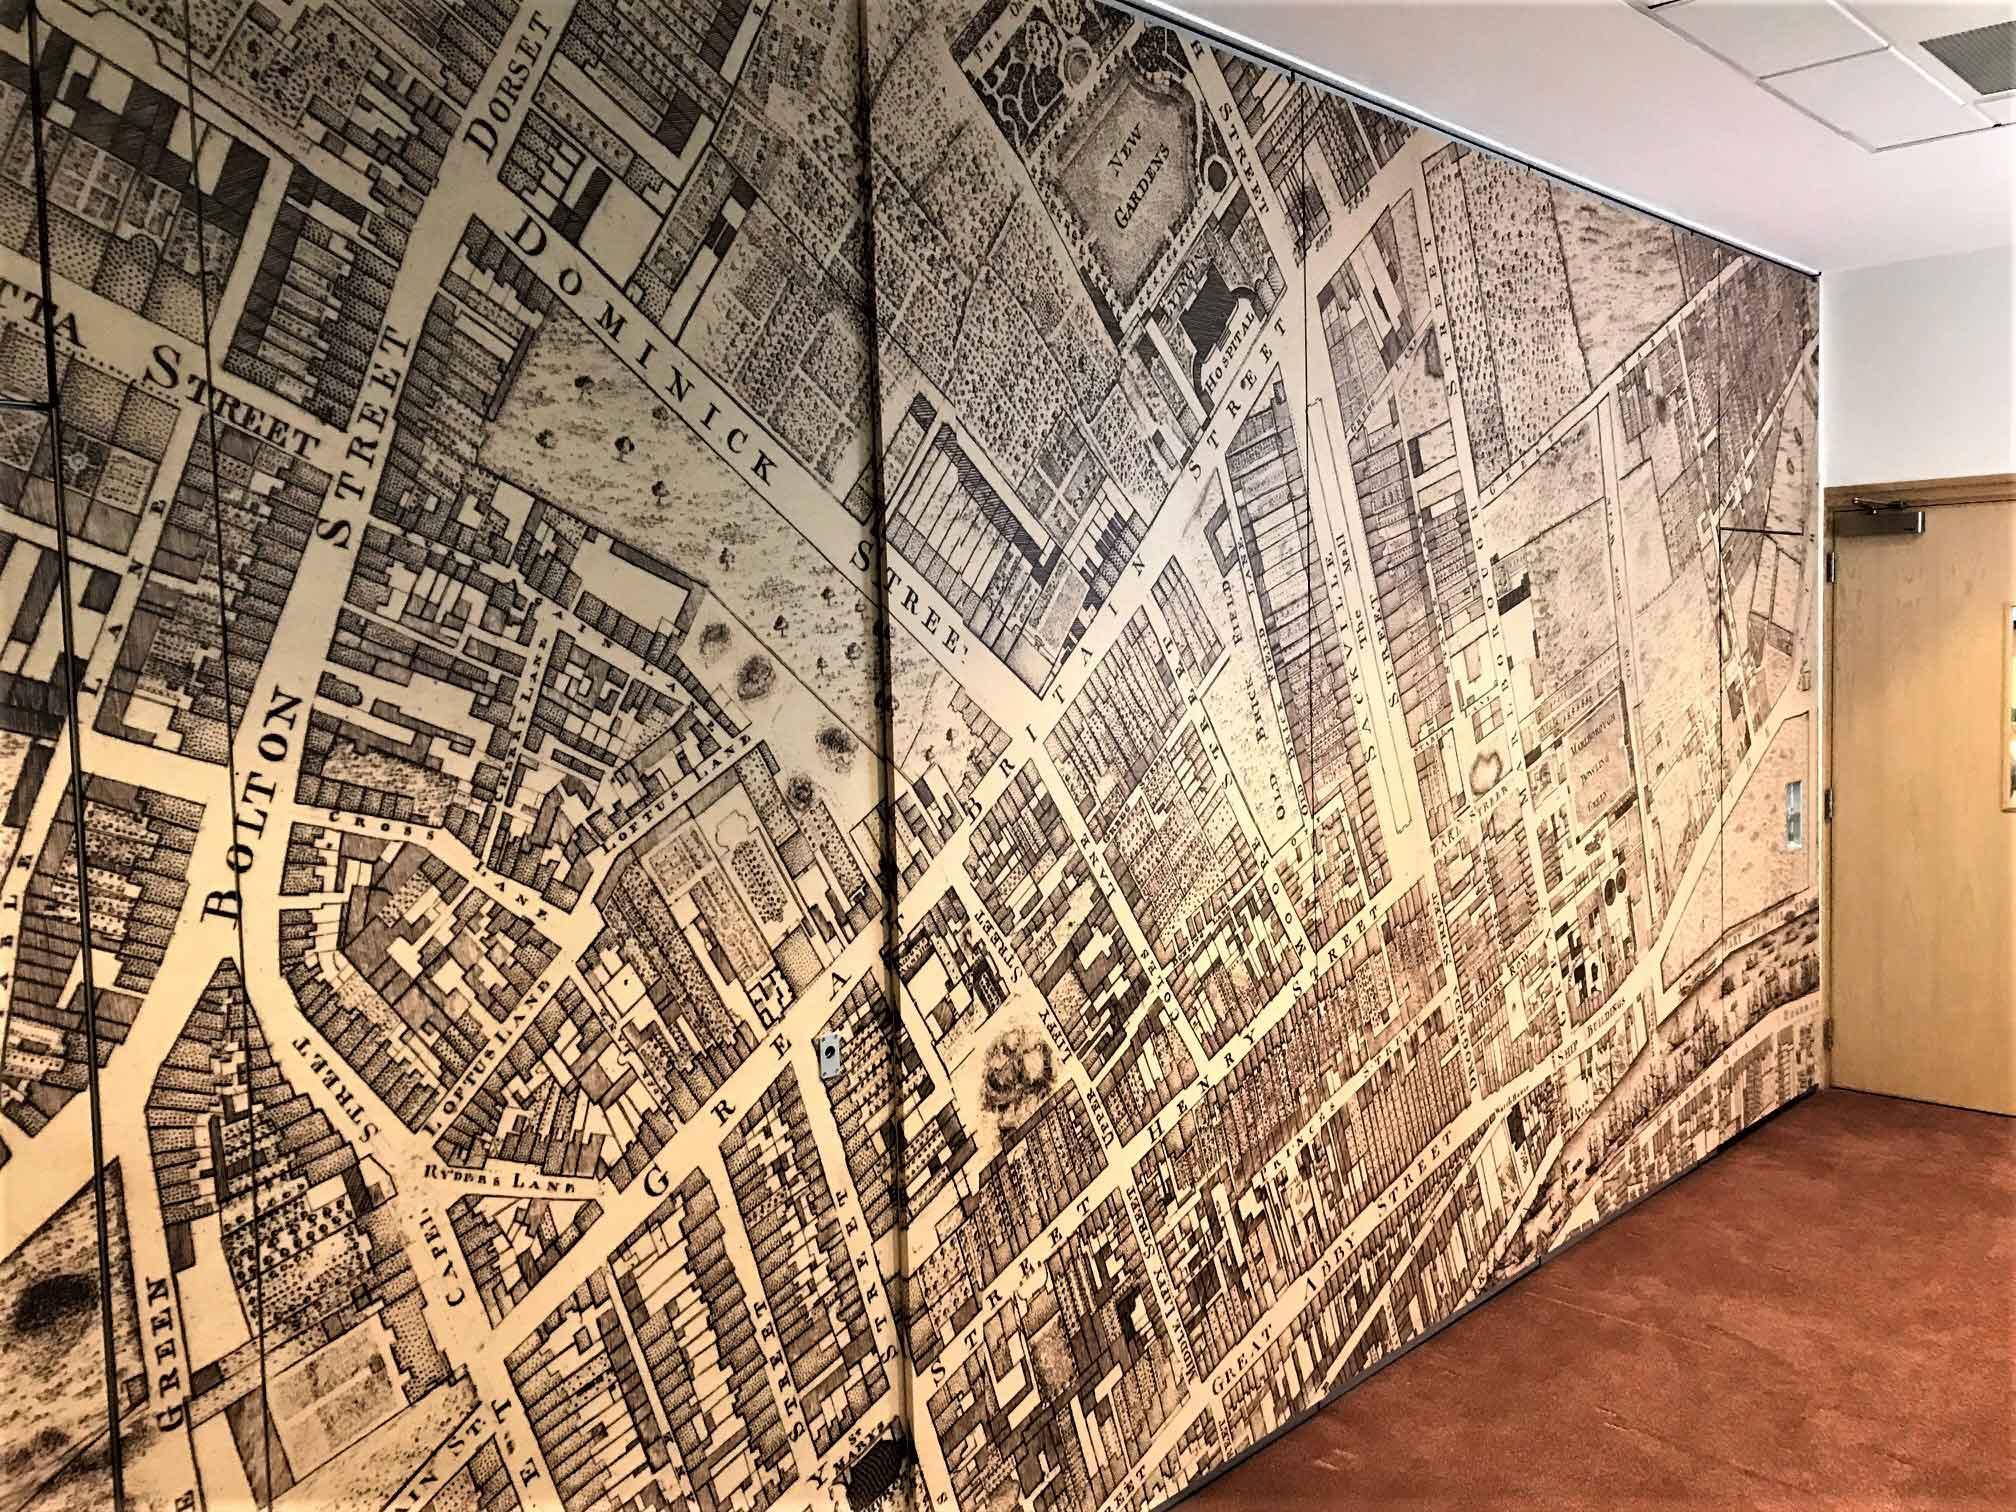 An bord pleanalla map wall vinyl display